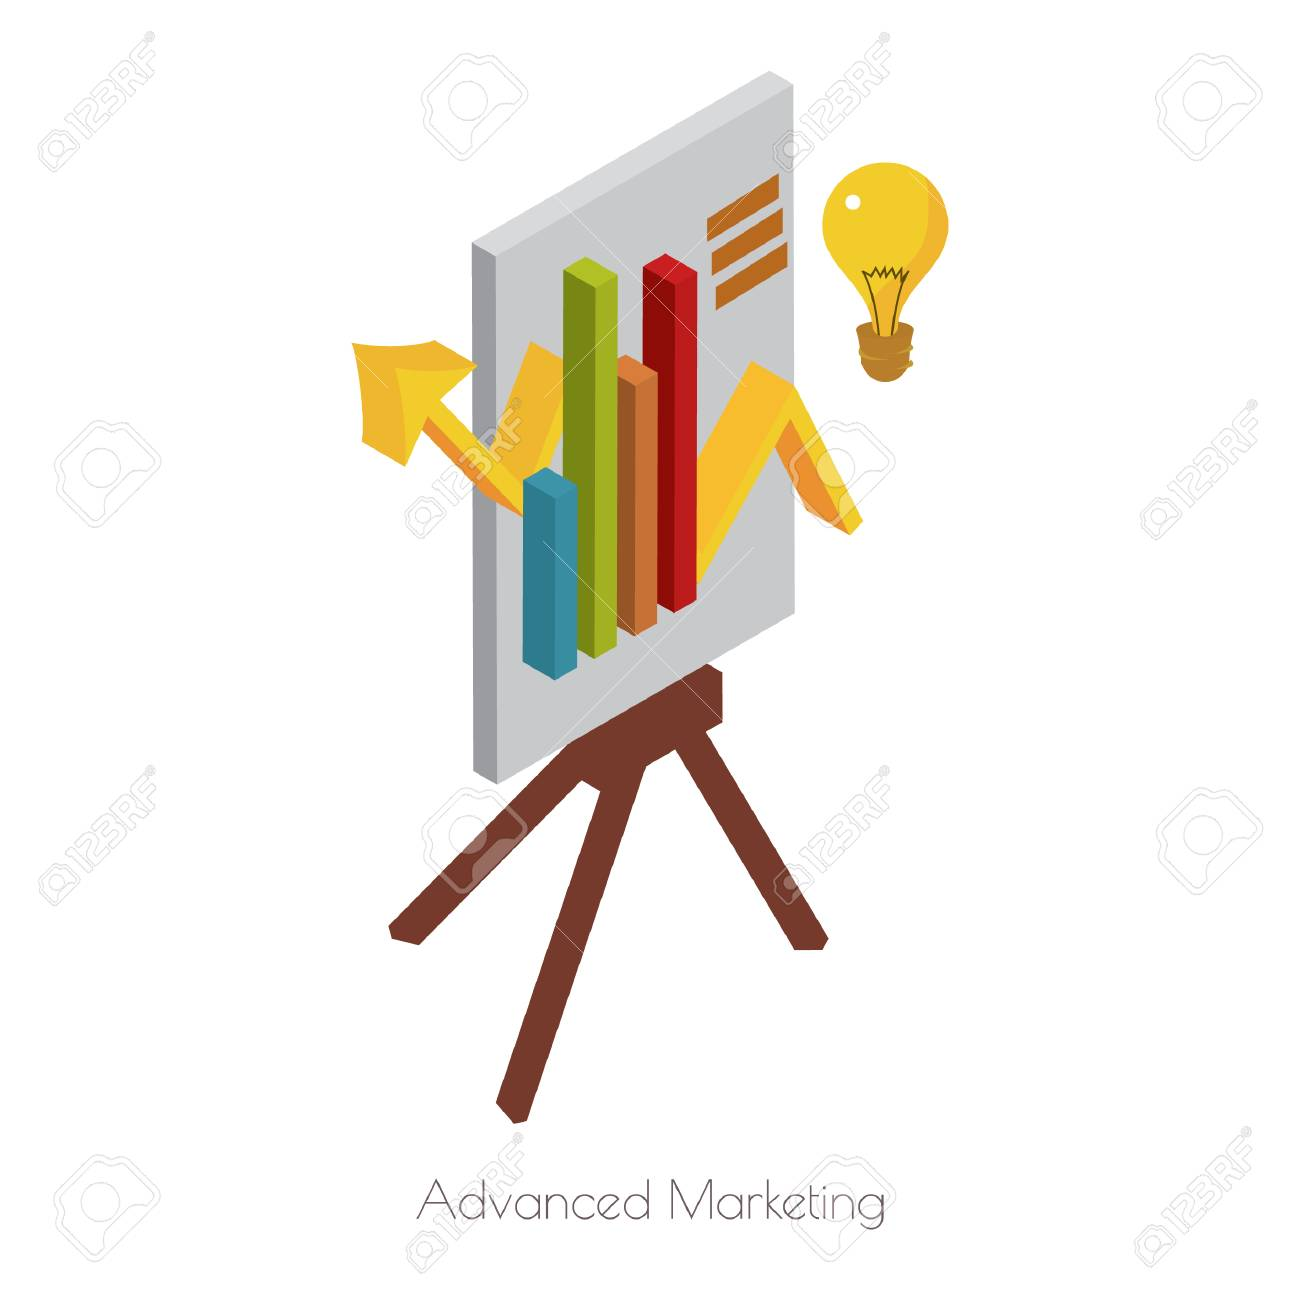 advanced marketing - 106668835